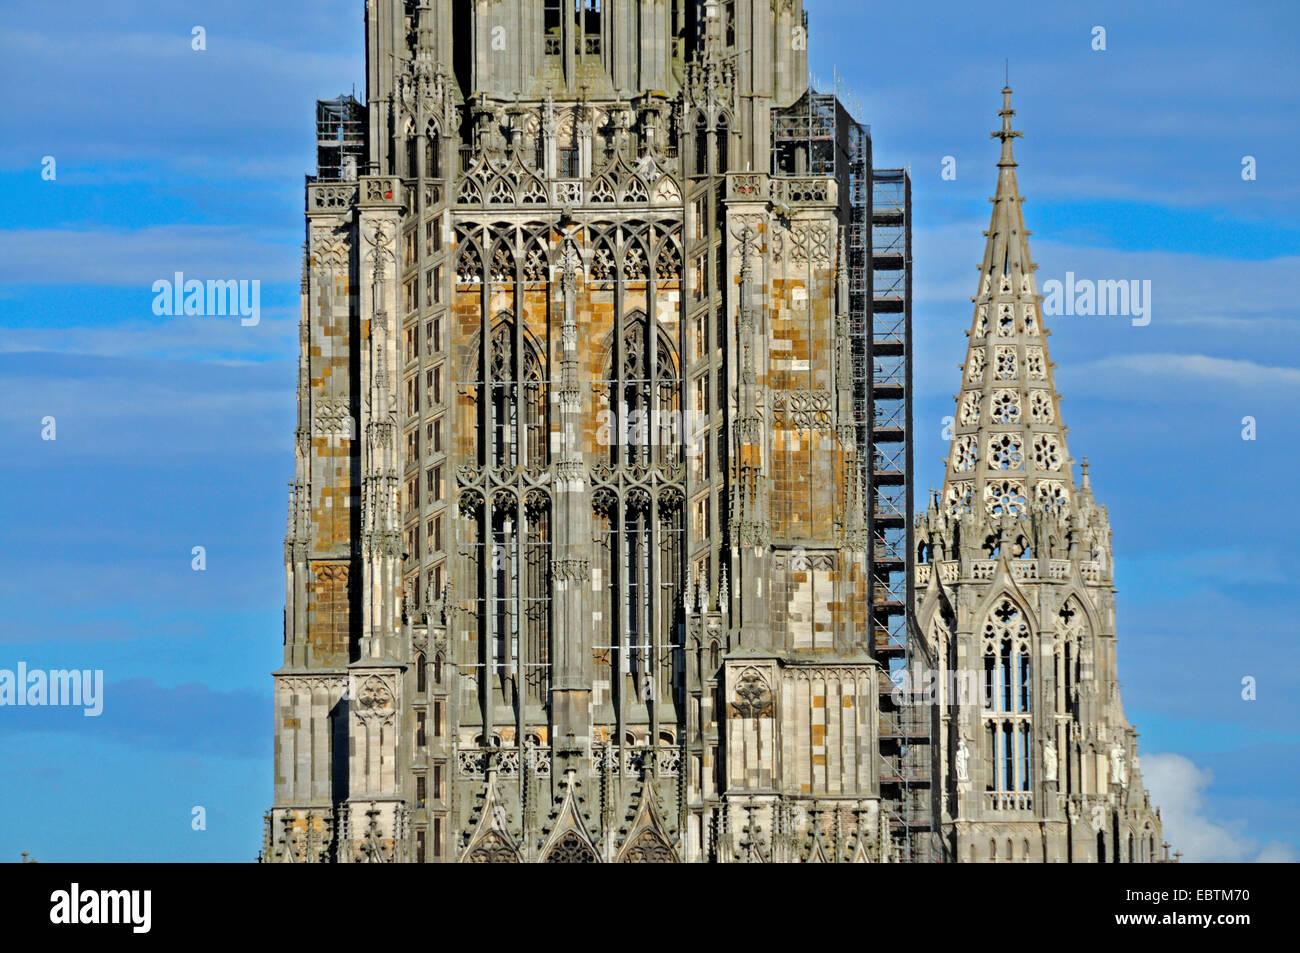 Ulm Minster, tallest church in the world, detail, Germany, Baden-Wuerttemberg, Ulm Stock Photo